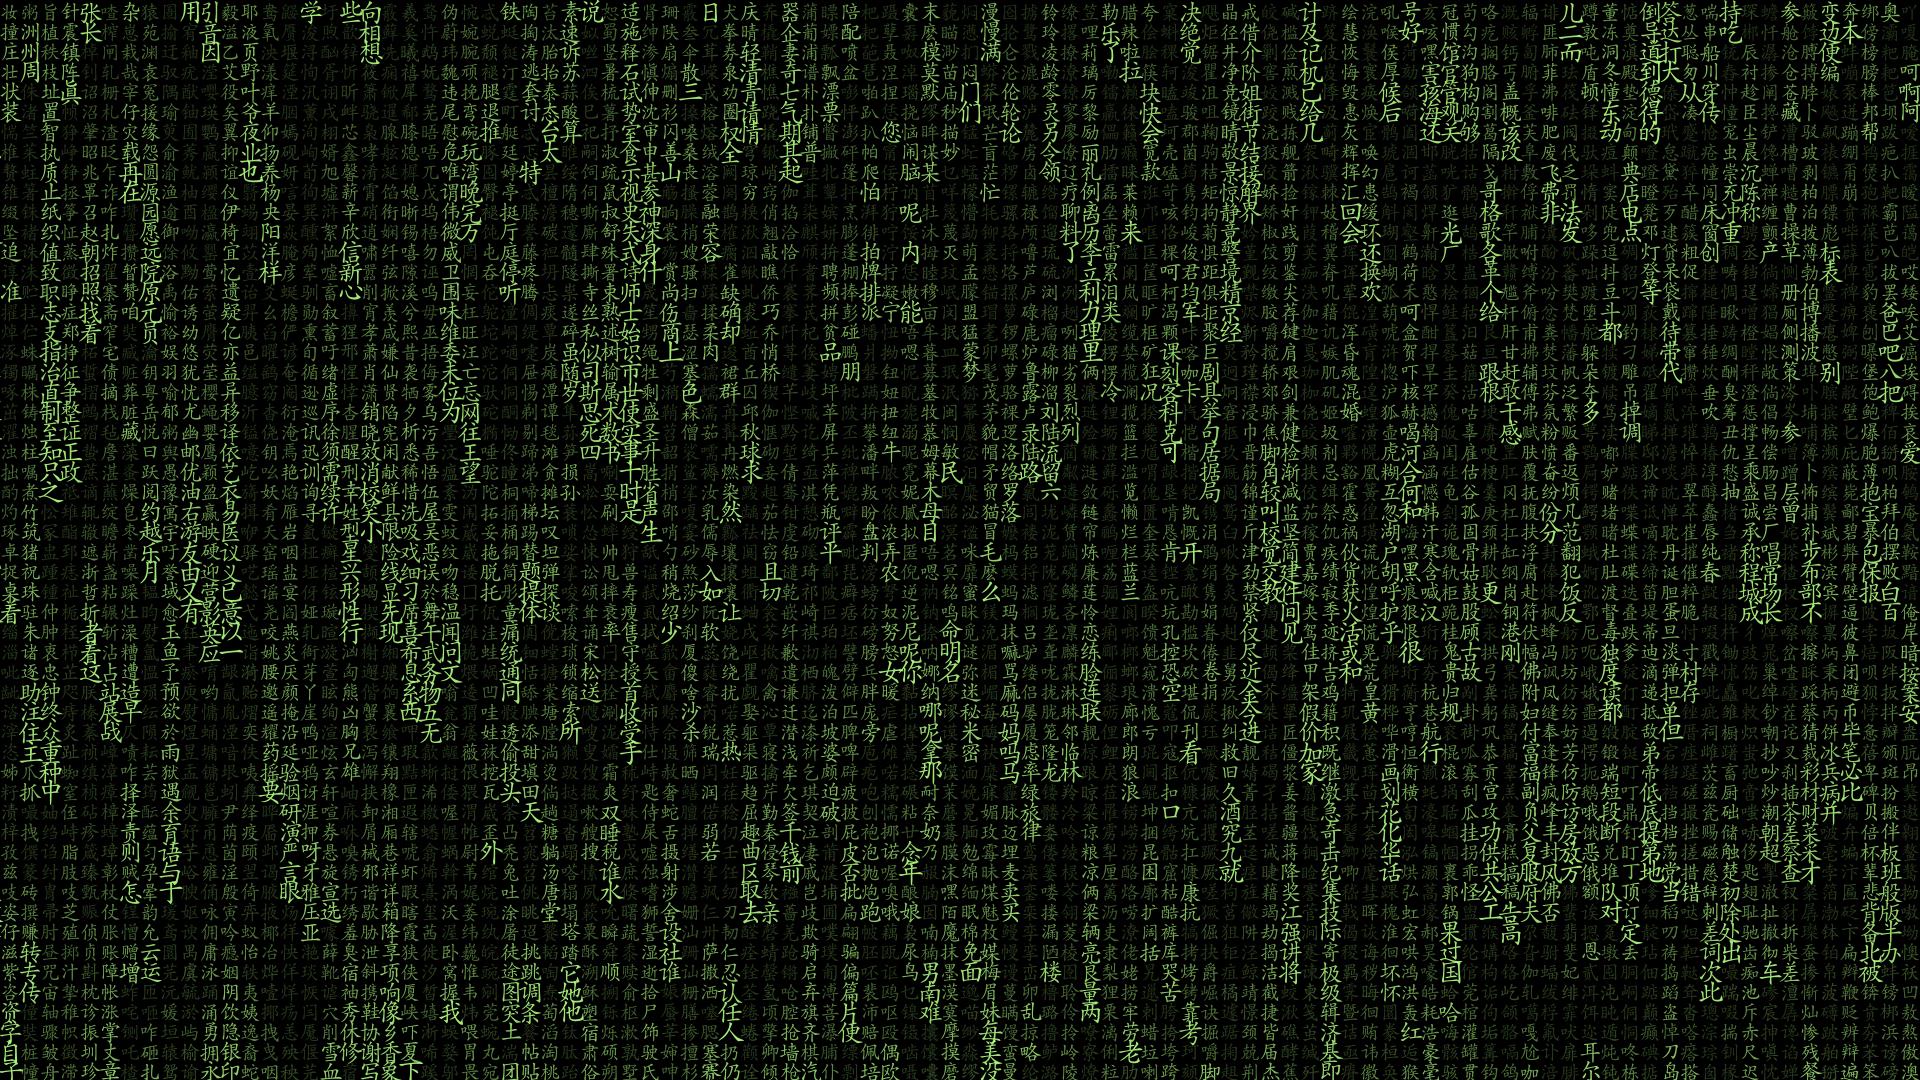 4k Matrix Code Wallpapers Top Free 4k Matrix Code Backgrounds Wallpaperaccess